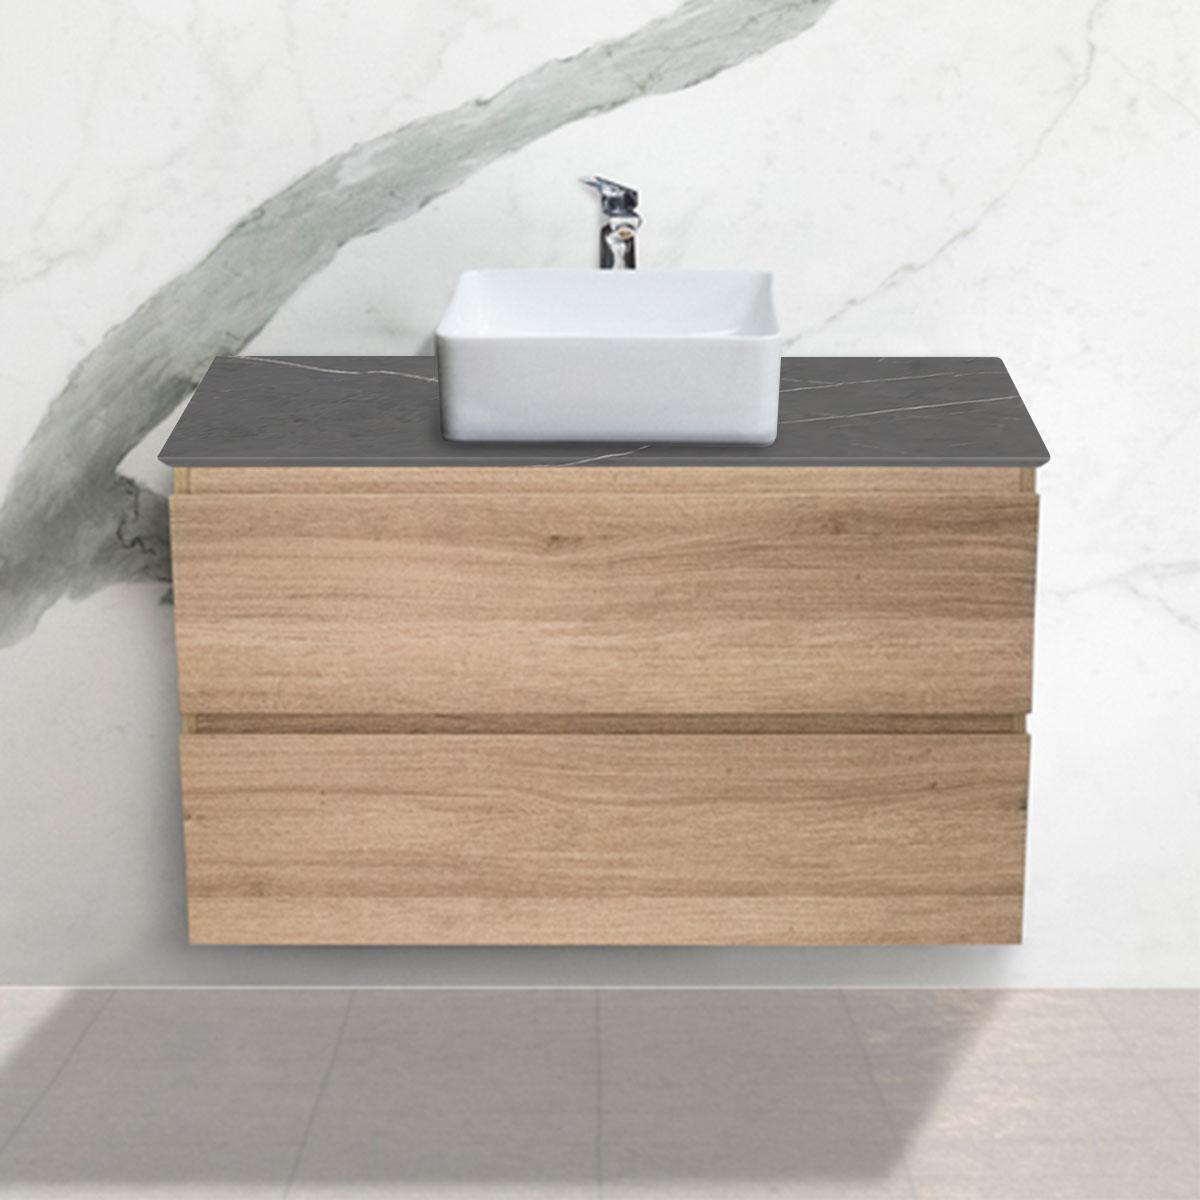 Large Oak Woodgrain Cabinet - Vanity- 2 Drawers - Pietra Grey - Stone3 Brisbane